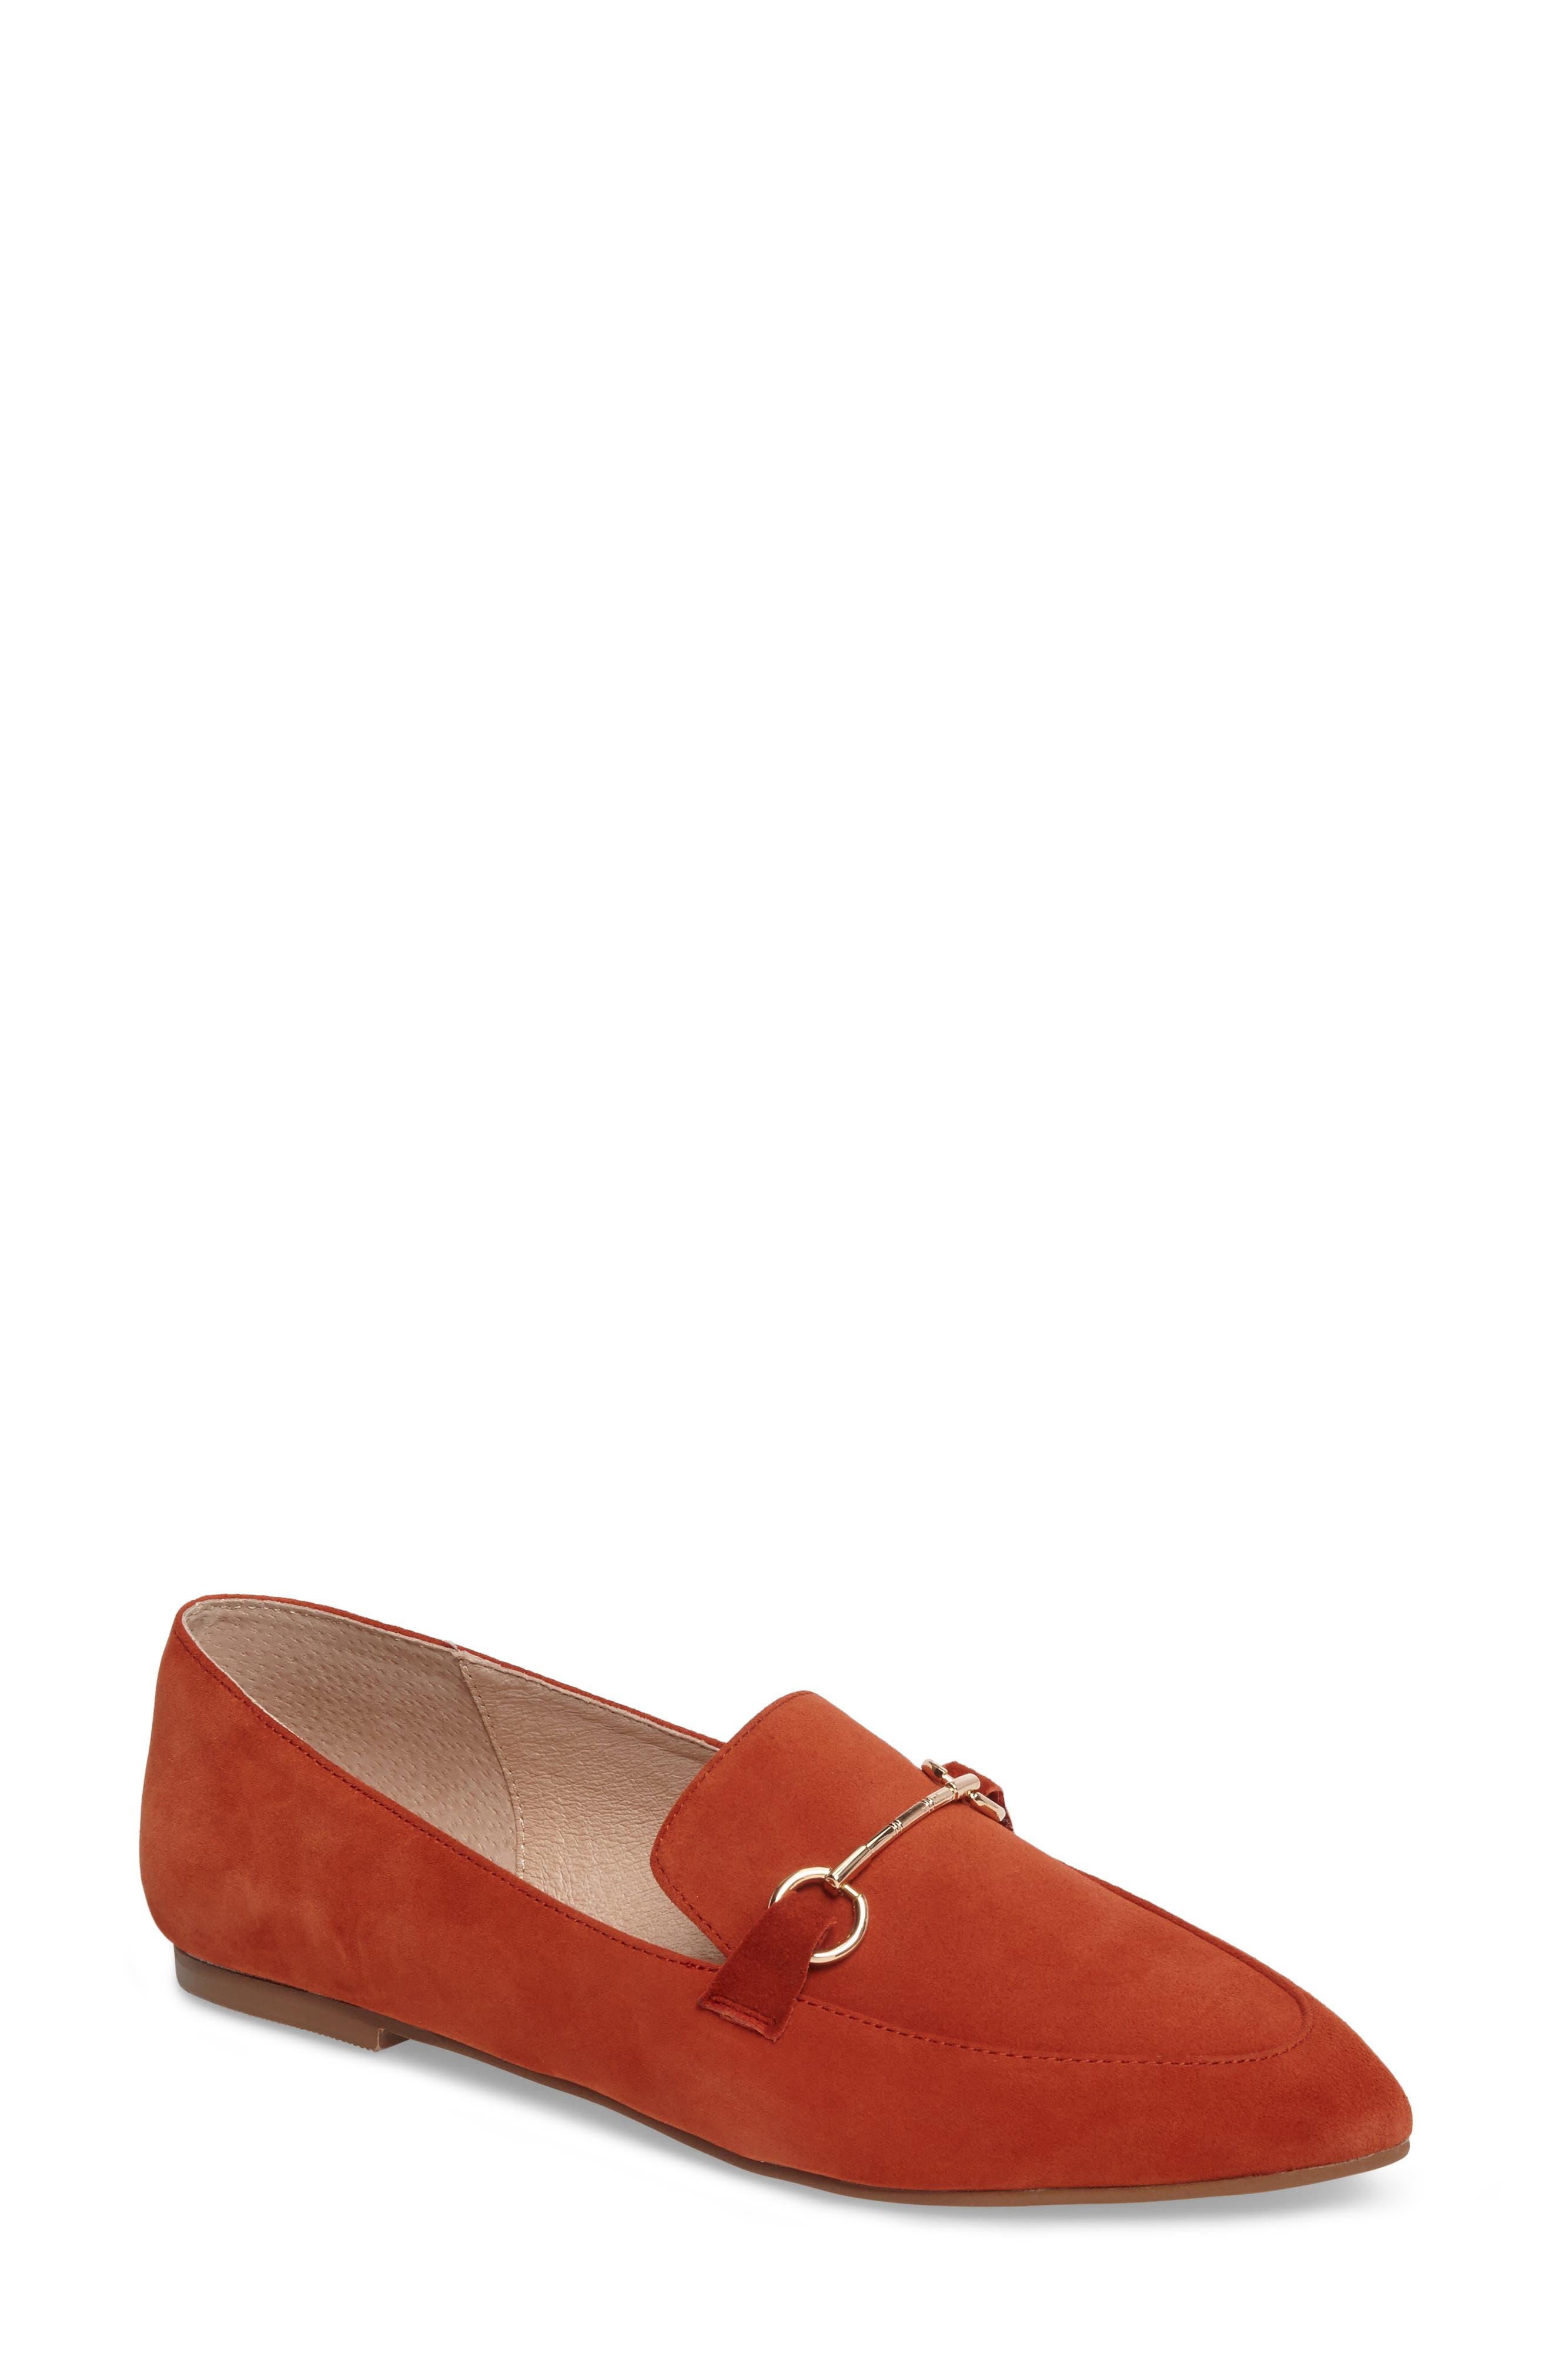 Kristin Cavallari Cambrie Loafer Flat (Women)